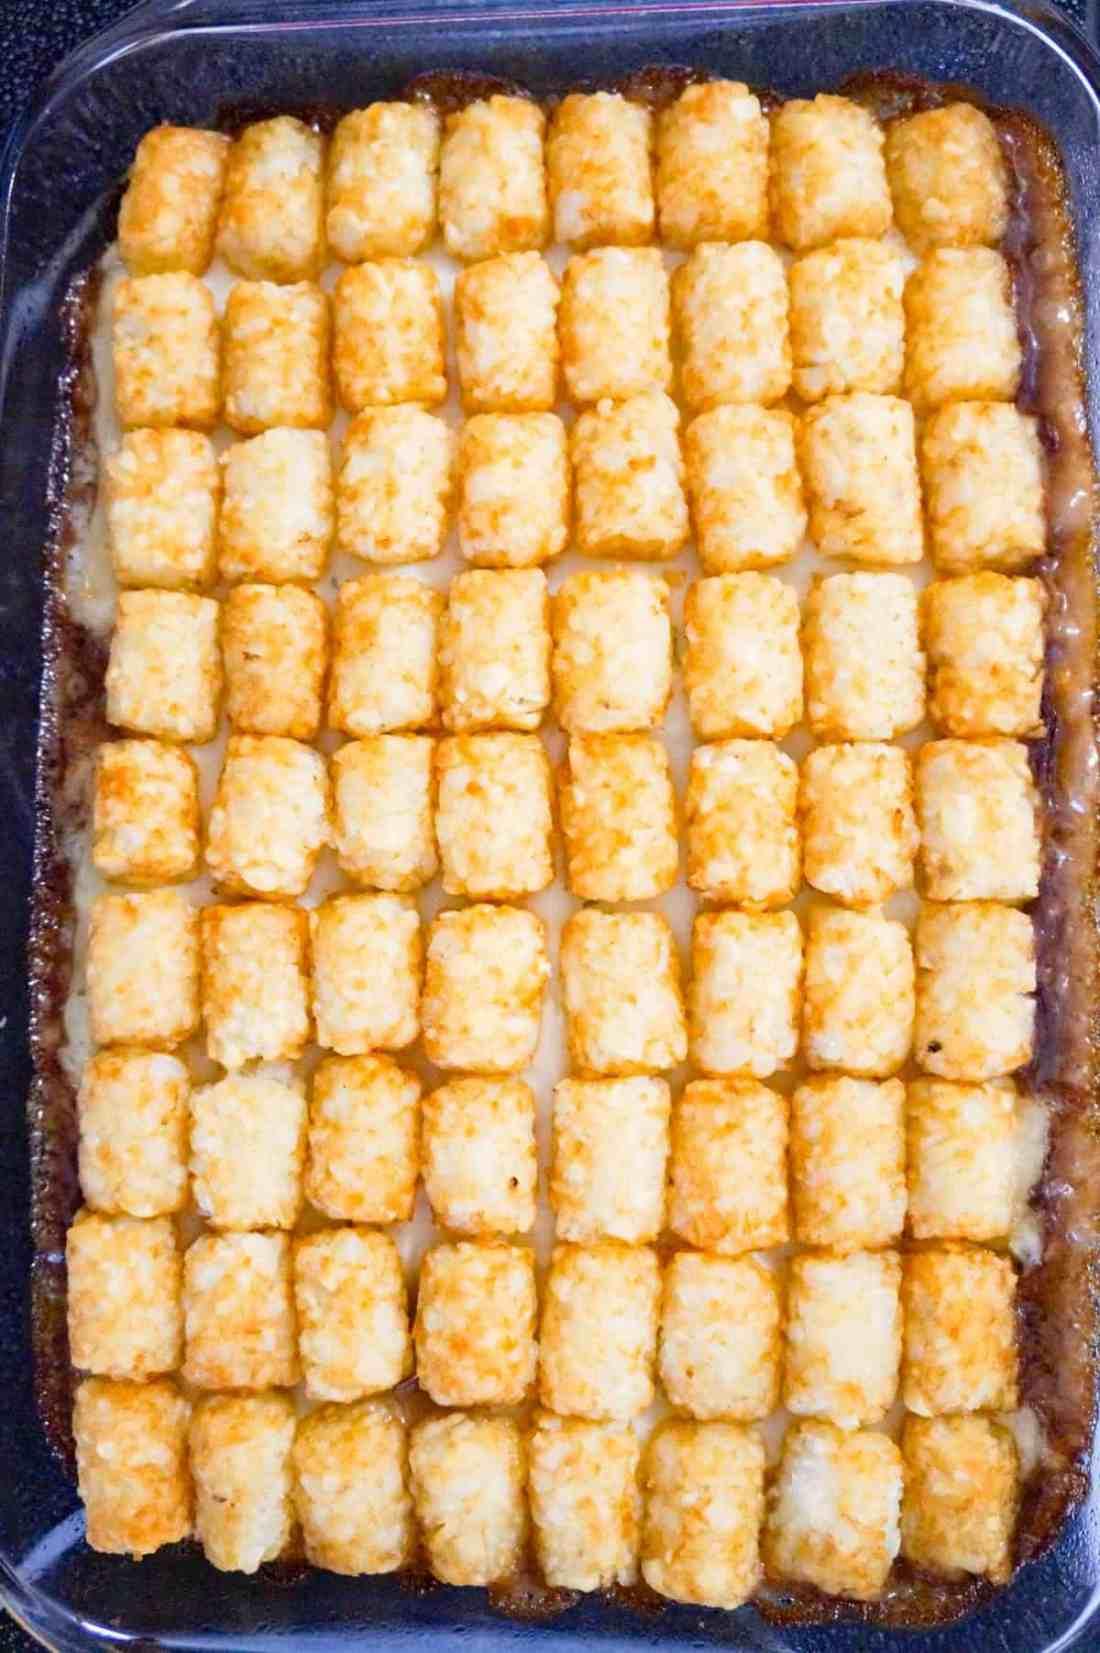 tater tot casserole after baking